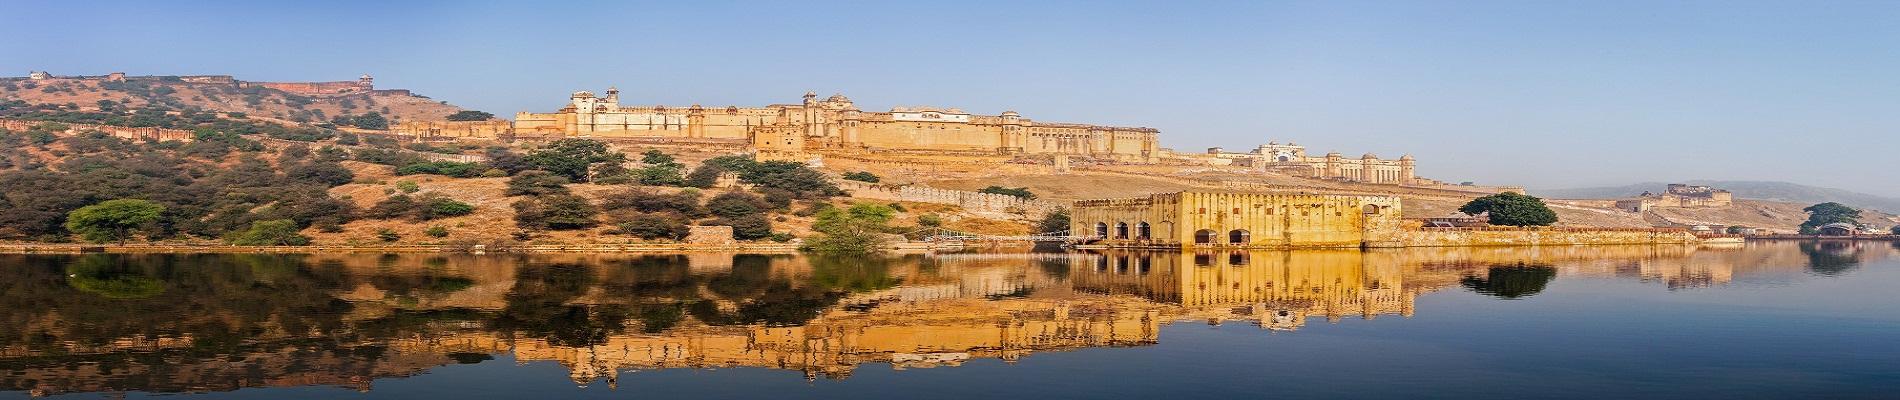 Image of discount stock brokers in Jaipur